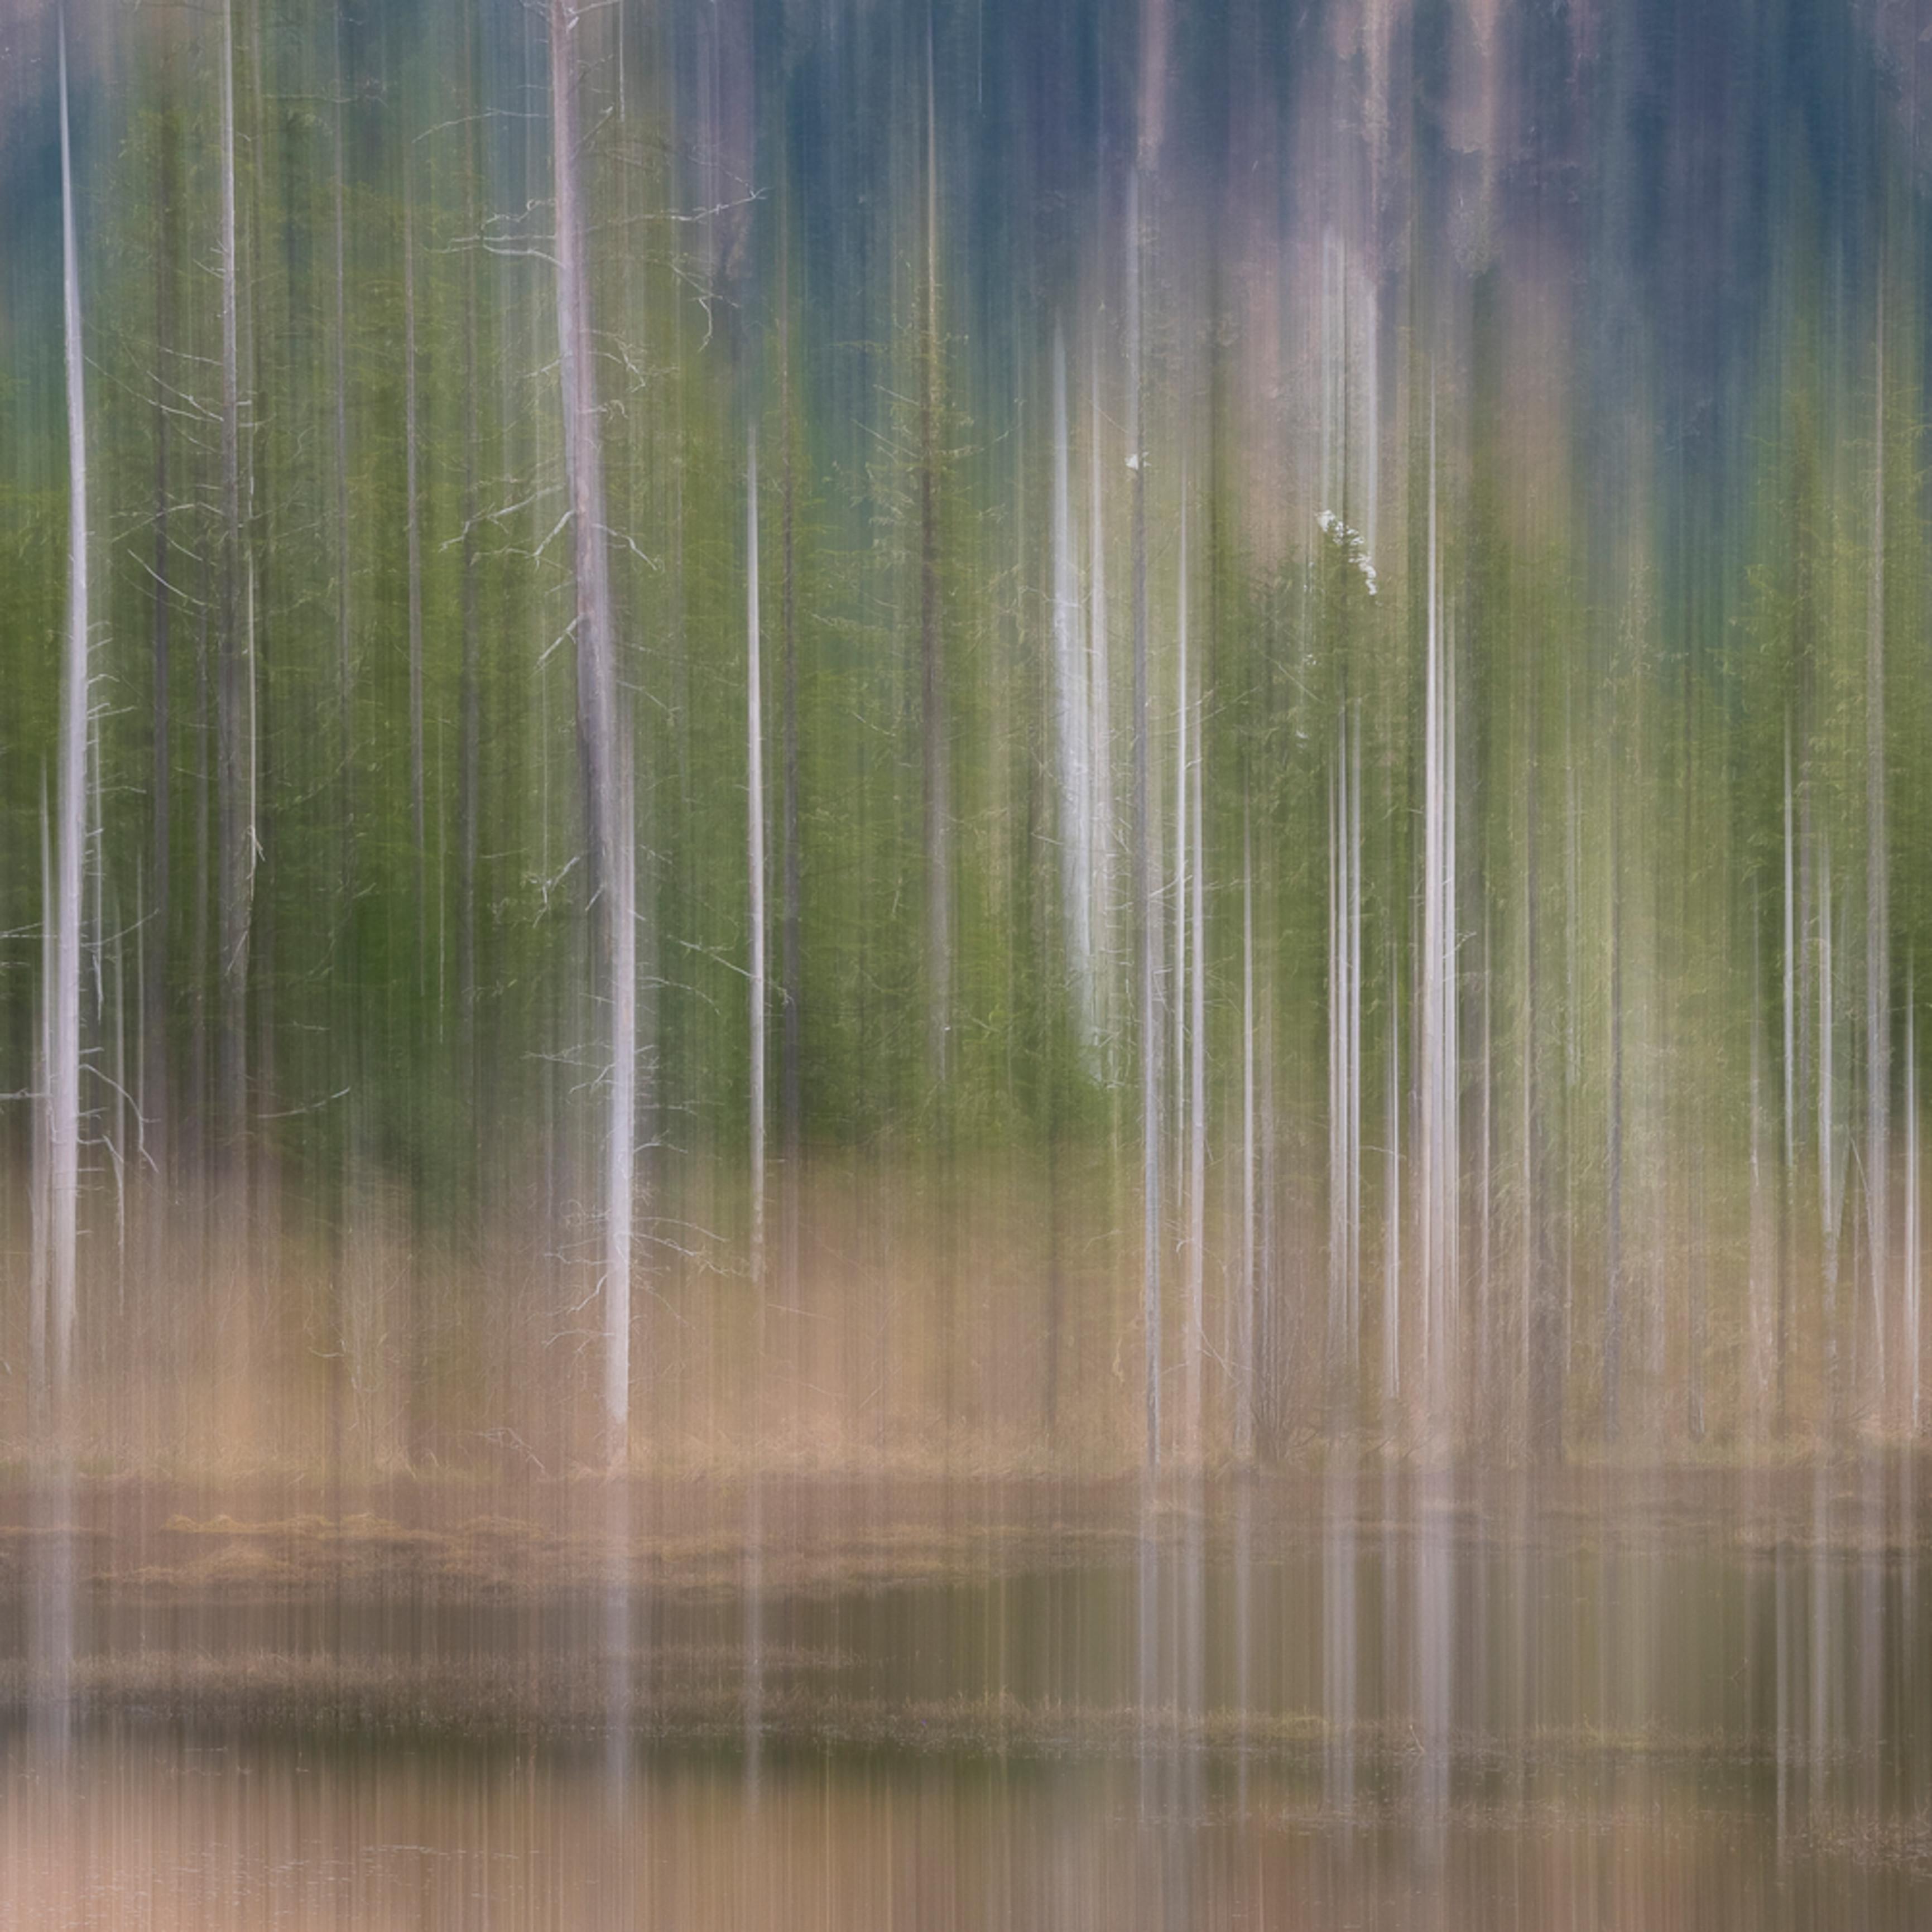 20190502 chugach national forest em13915 artstorefronts trzesv